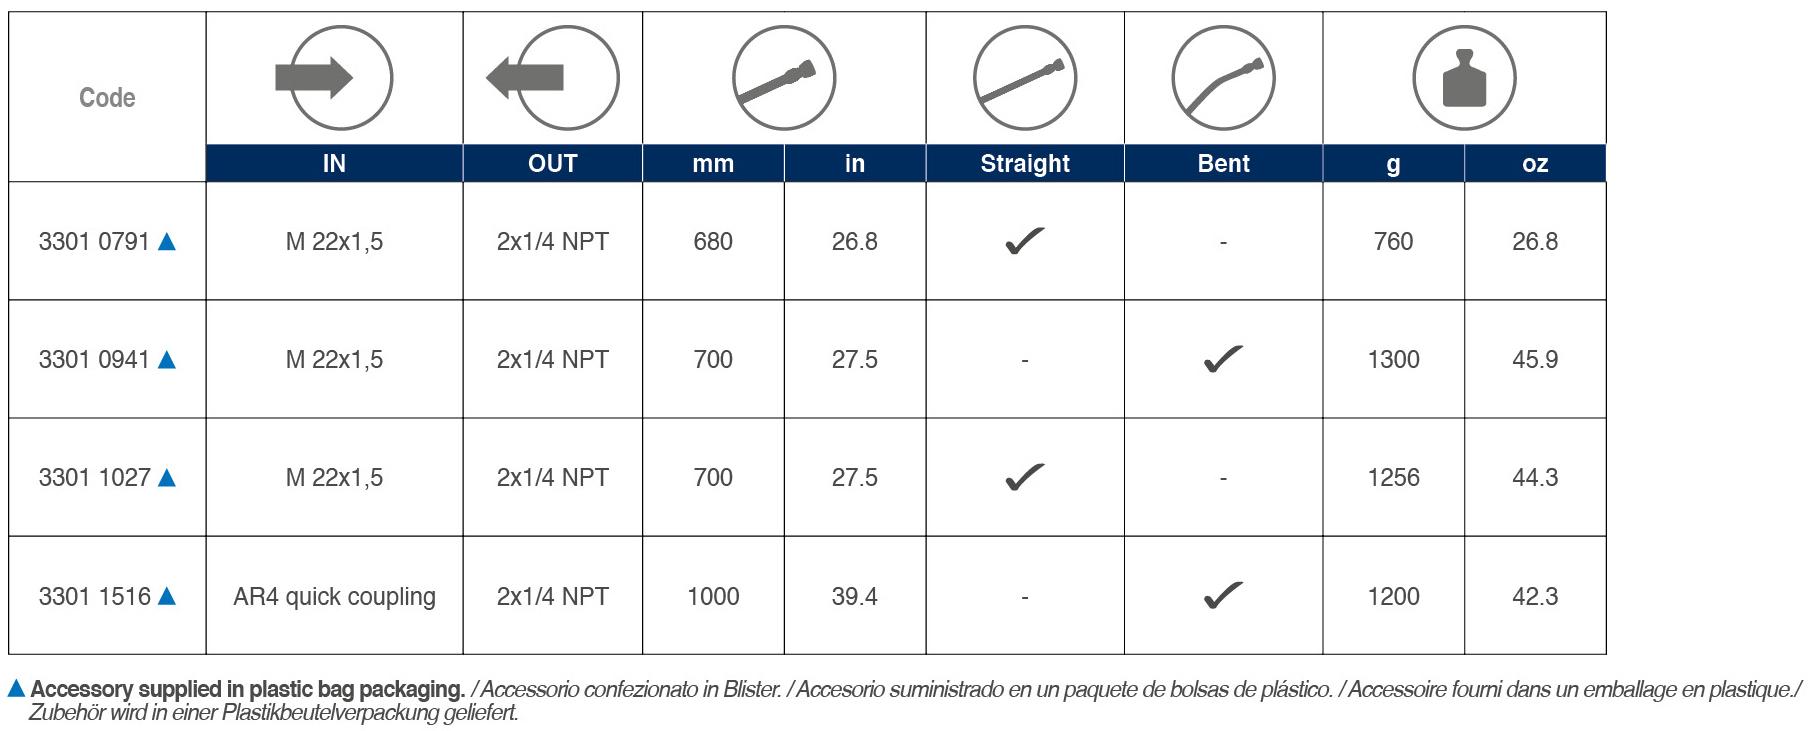 Double Barrel Lance Kit tabelle 02